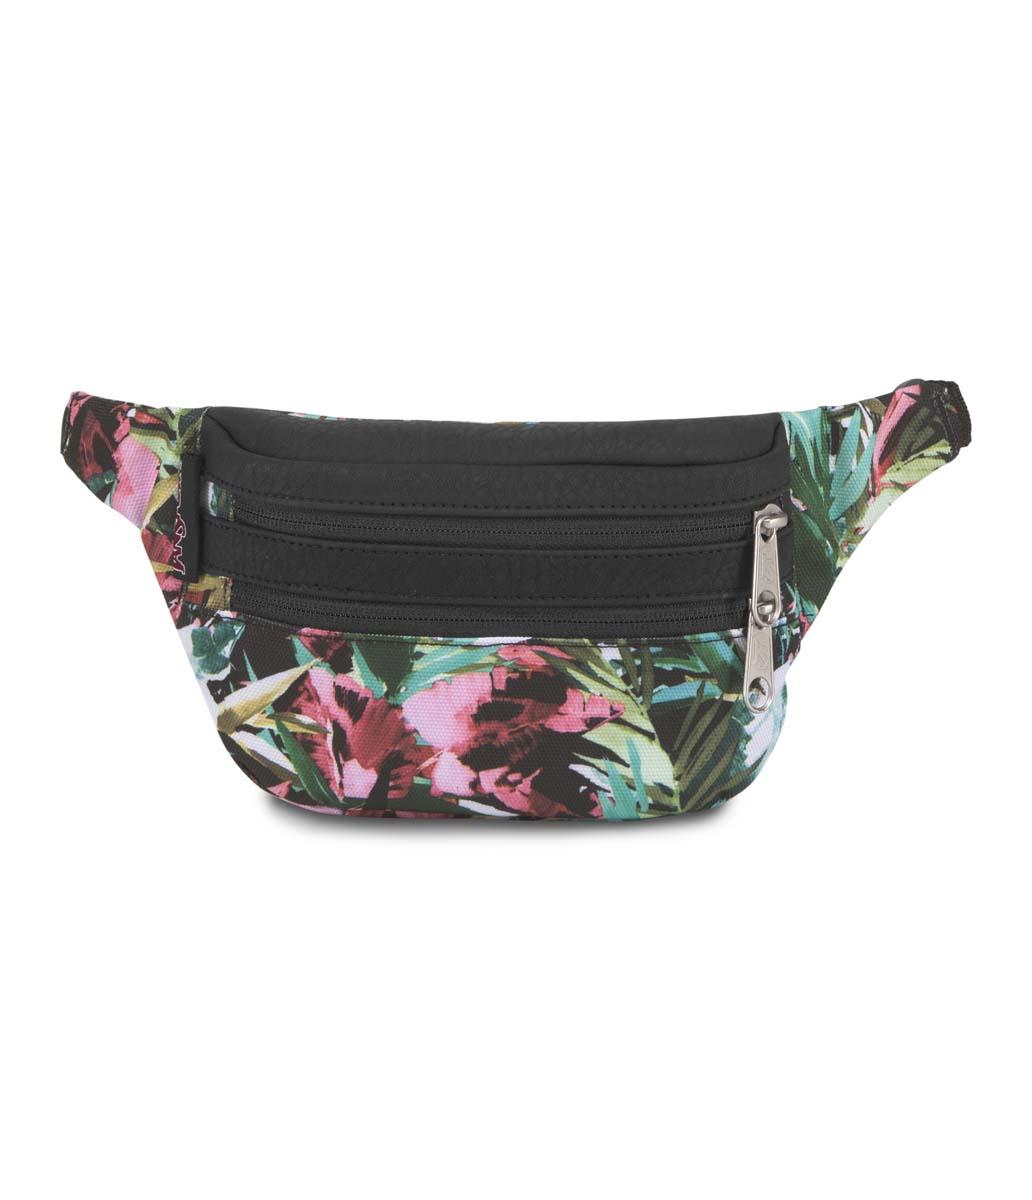 JanSport กระเป๋าเป้ รุ่น Hippyland - Tropicalia